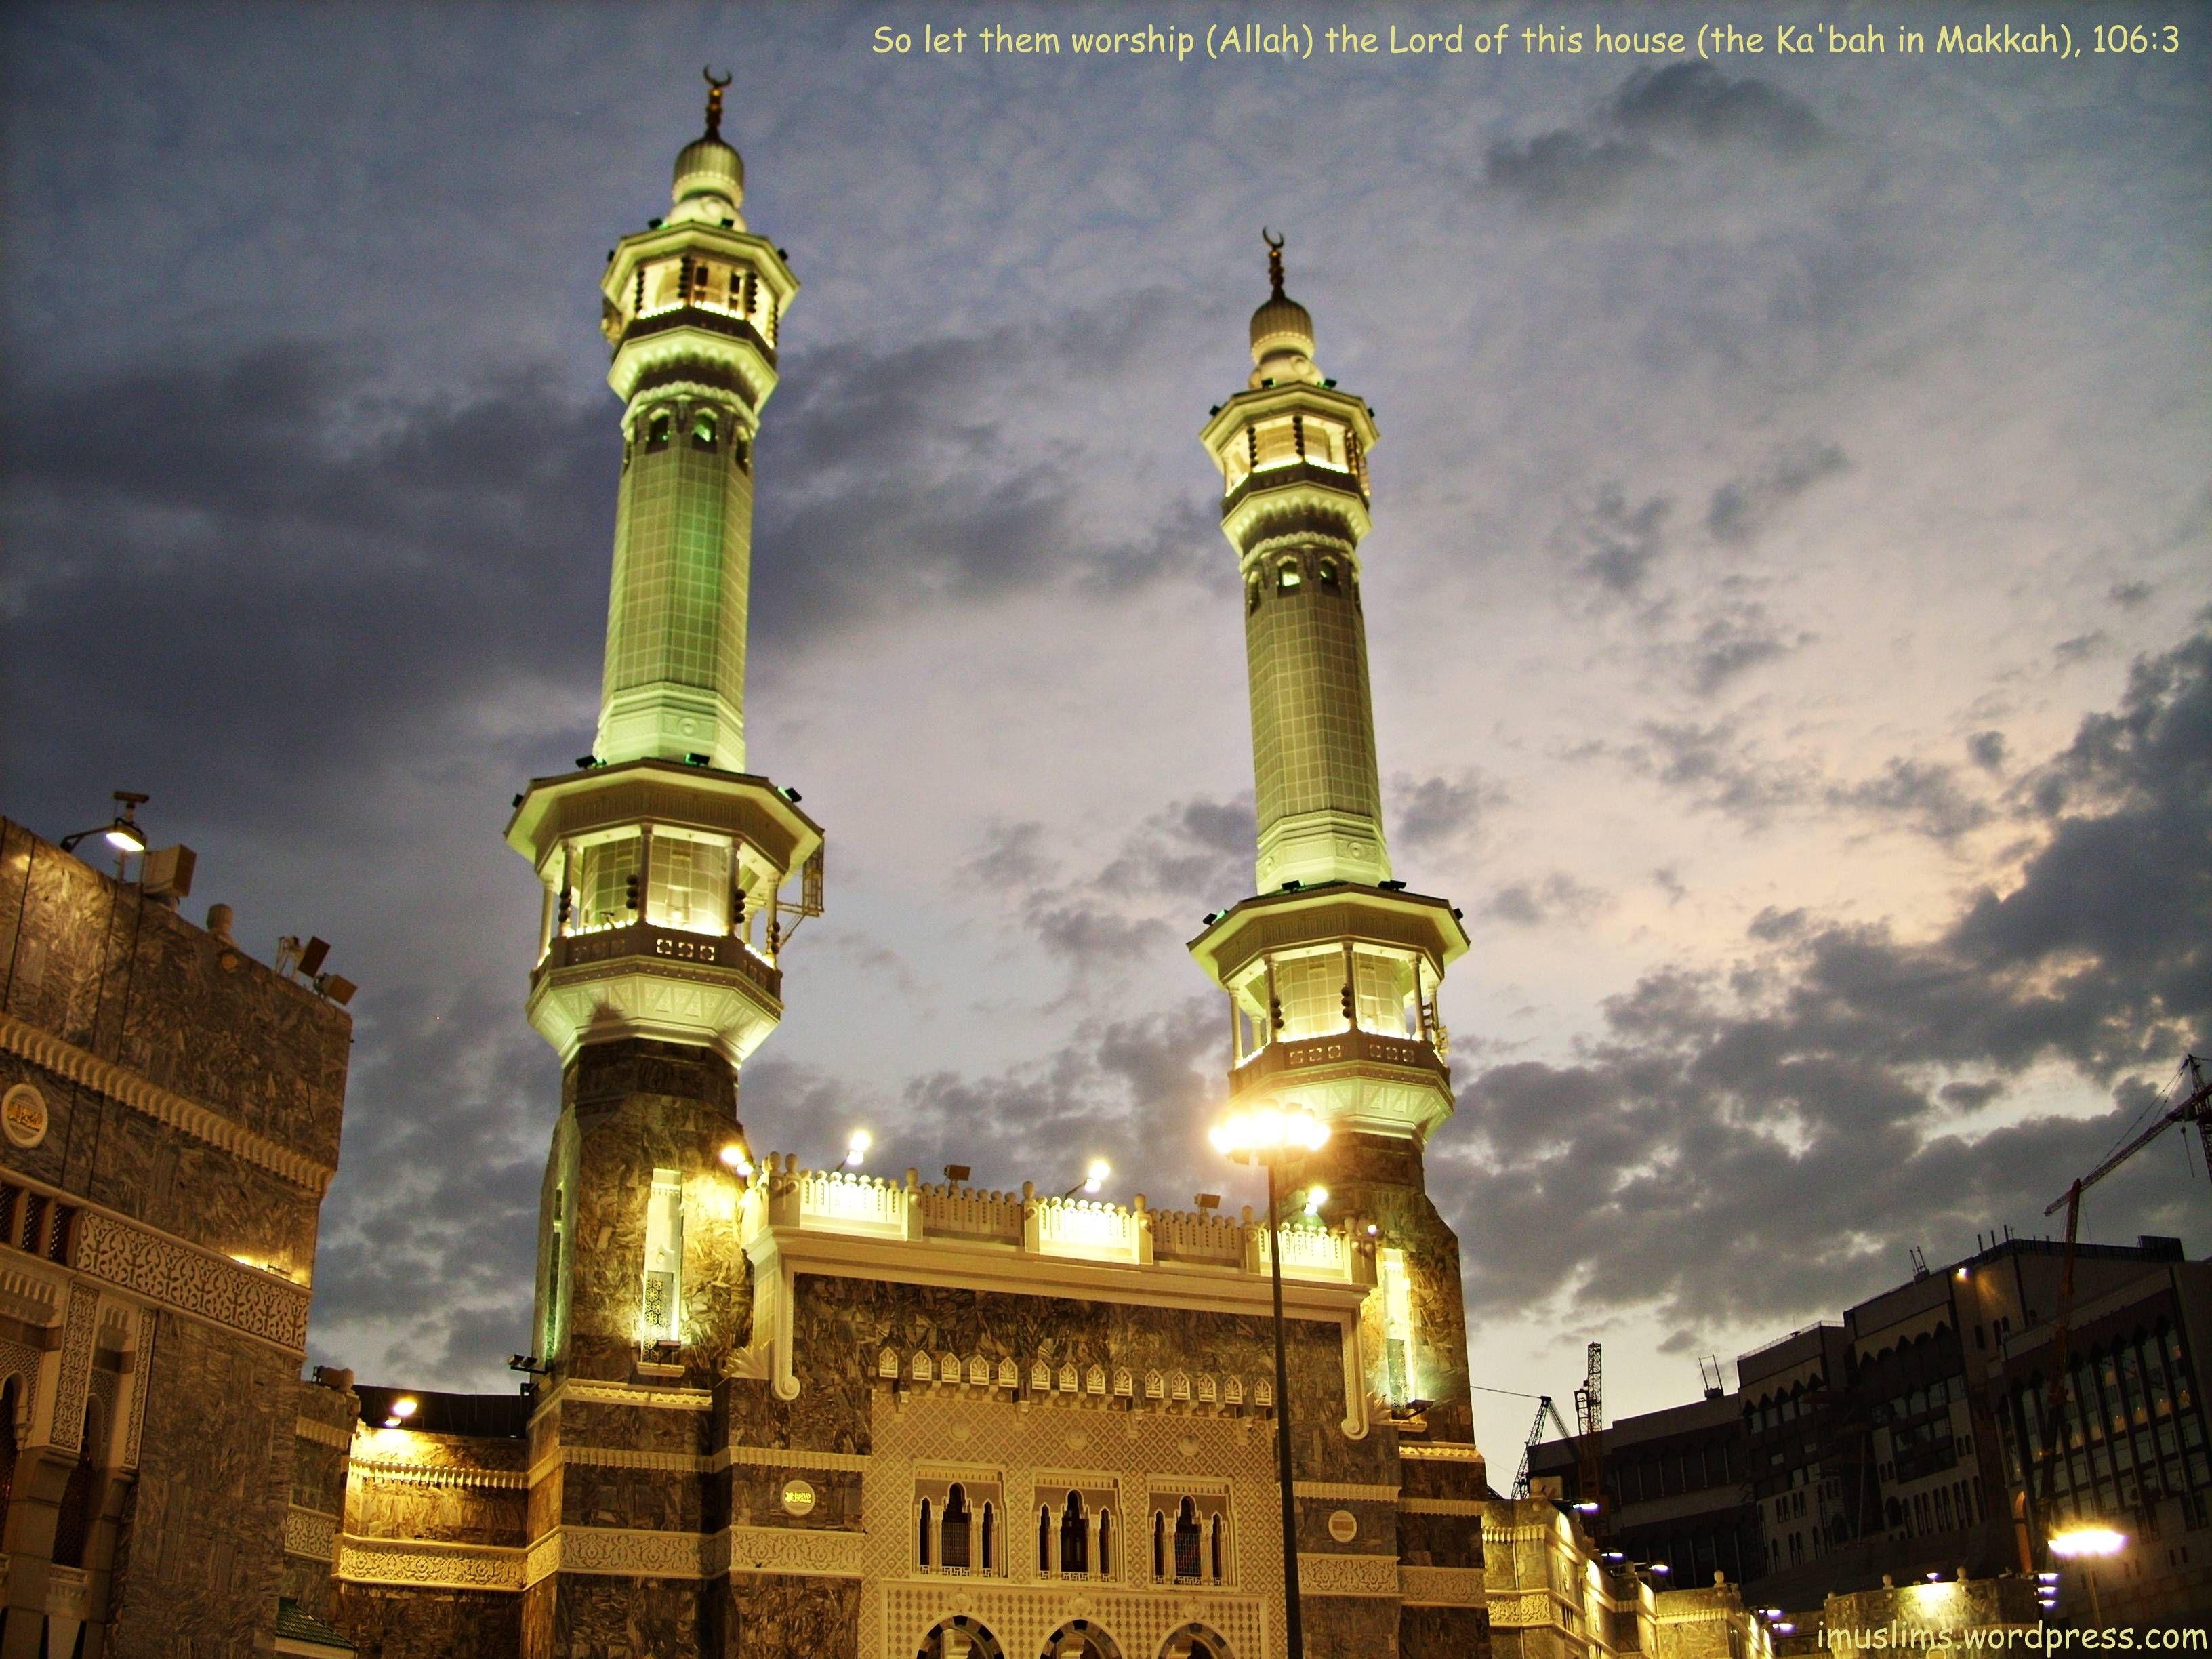 Wallpaper iphone kabah - Kabah Imuslims